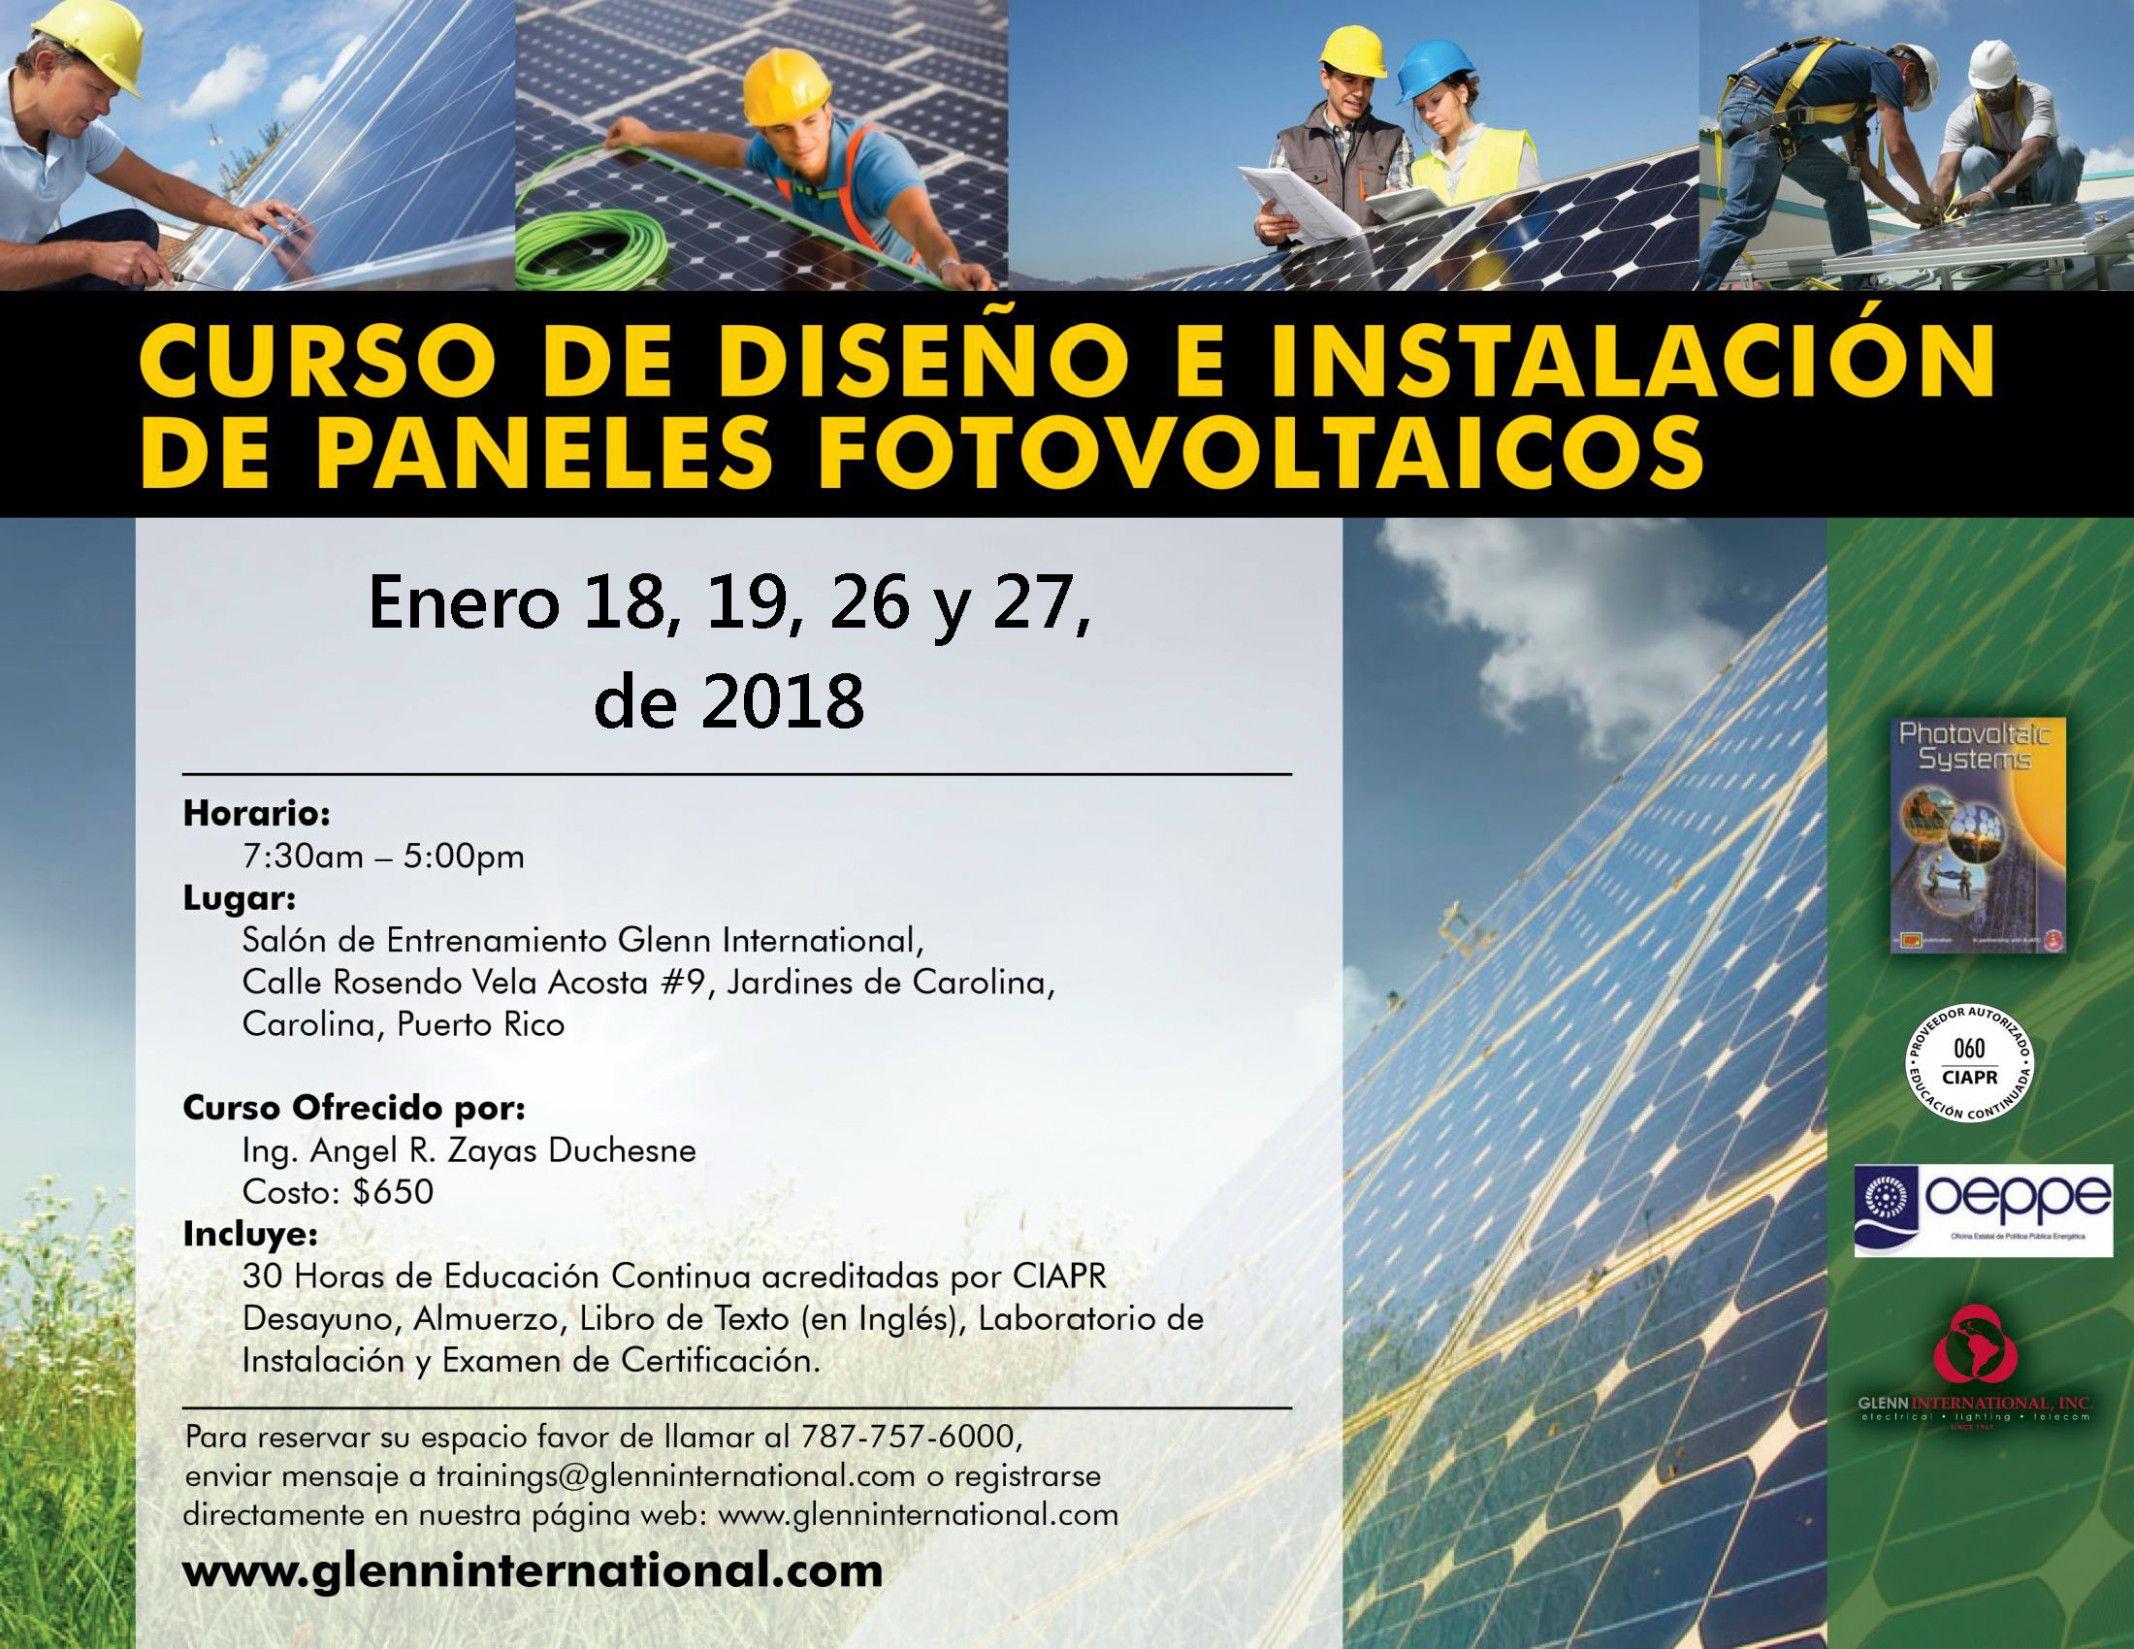 Diseno De Jardines Puerto Rico Check More At Https Www Epalumni Com Dise C3 B1o De Jardines Puerto Rico In 2020 Event